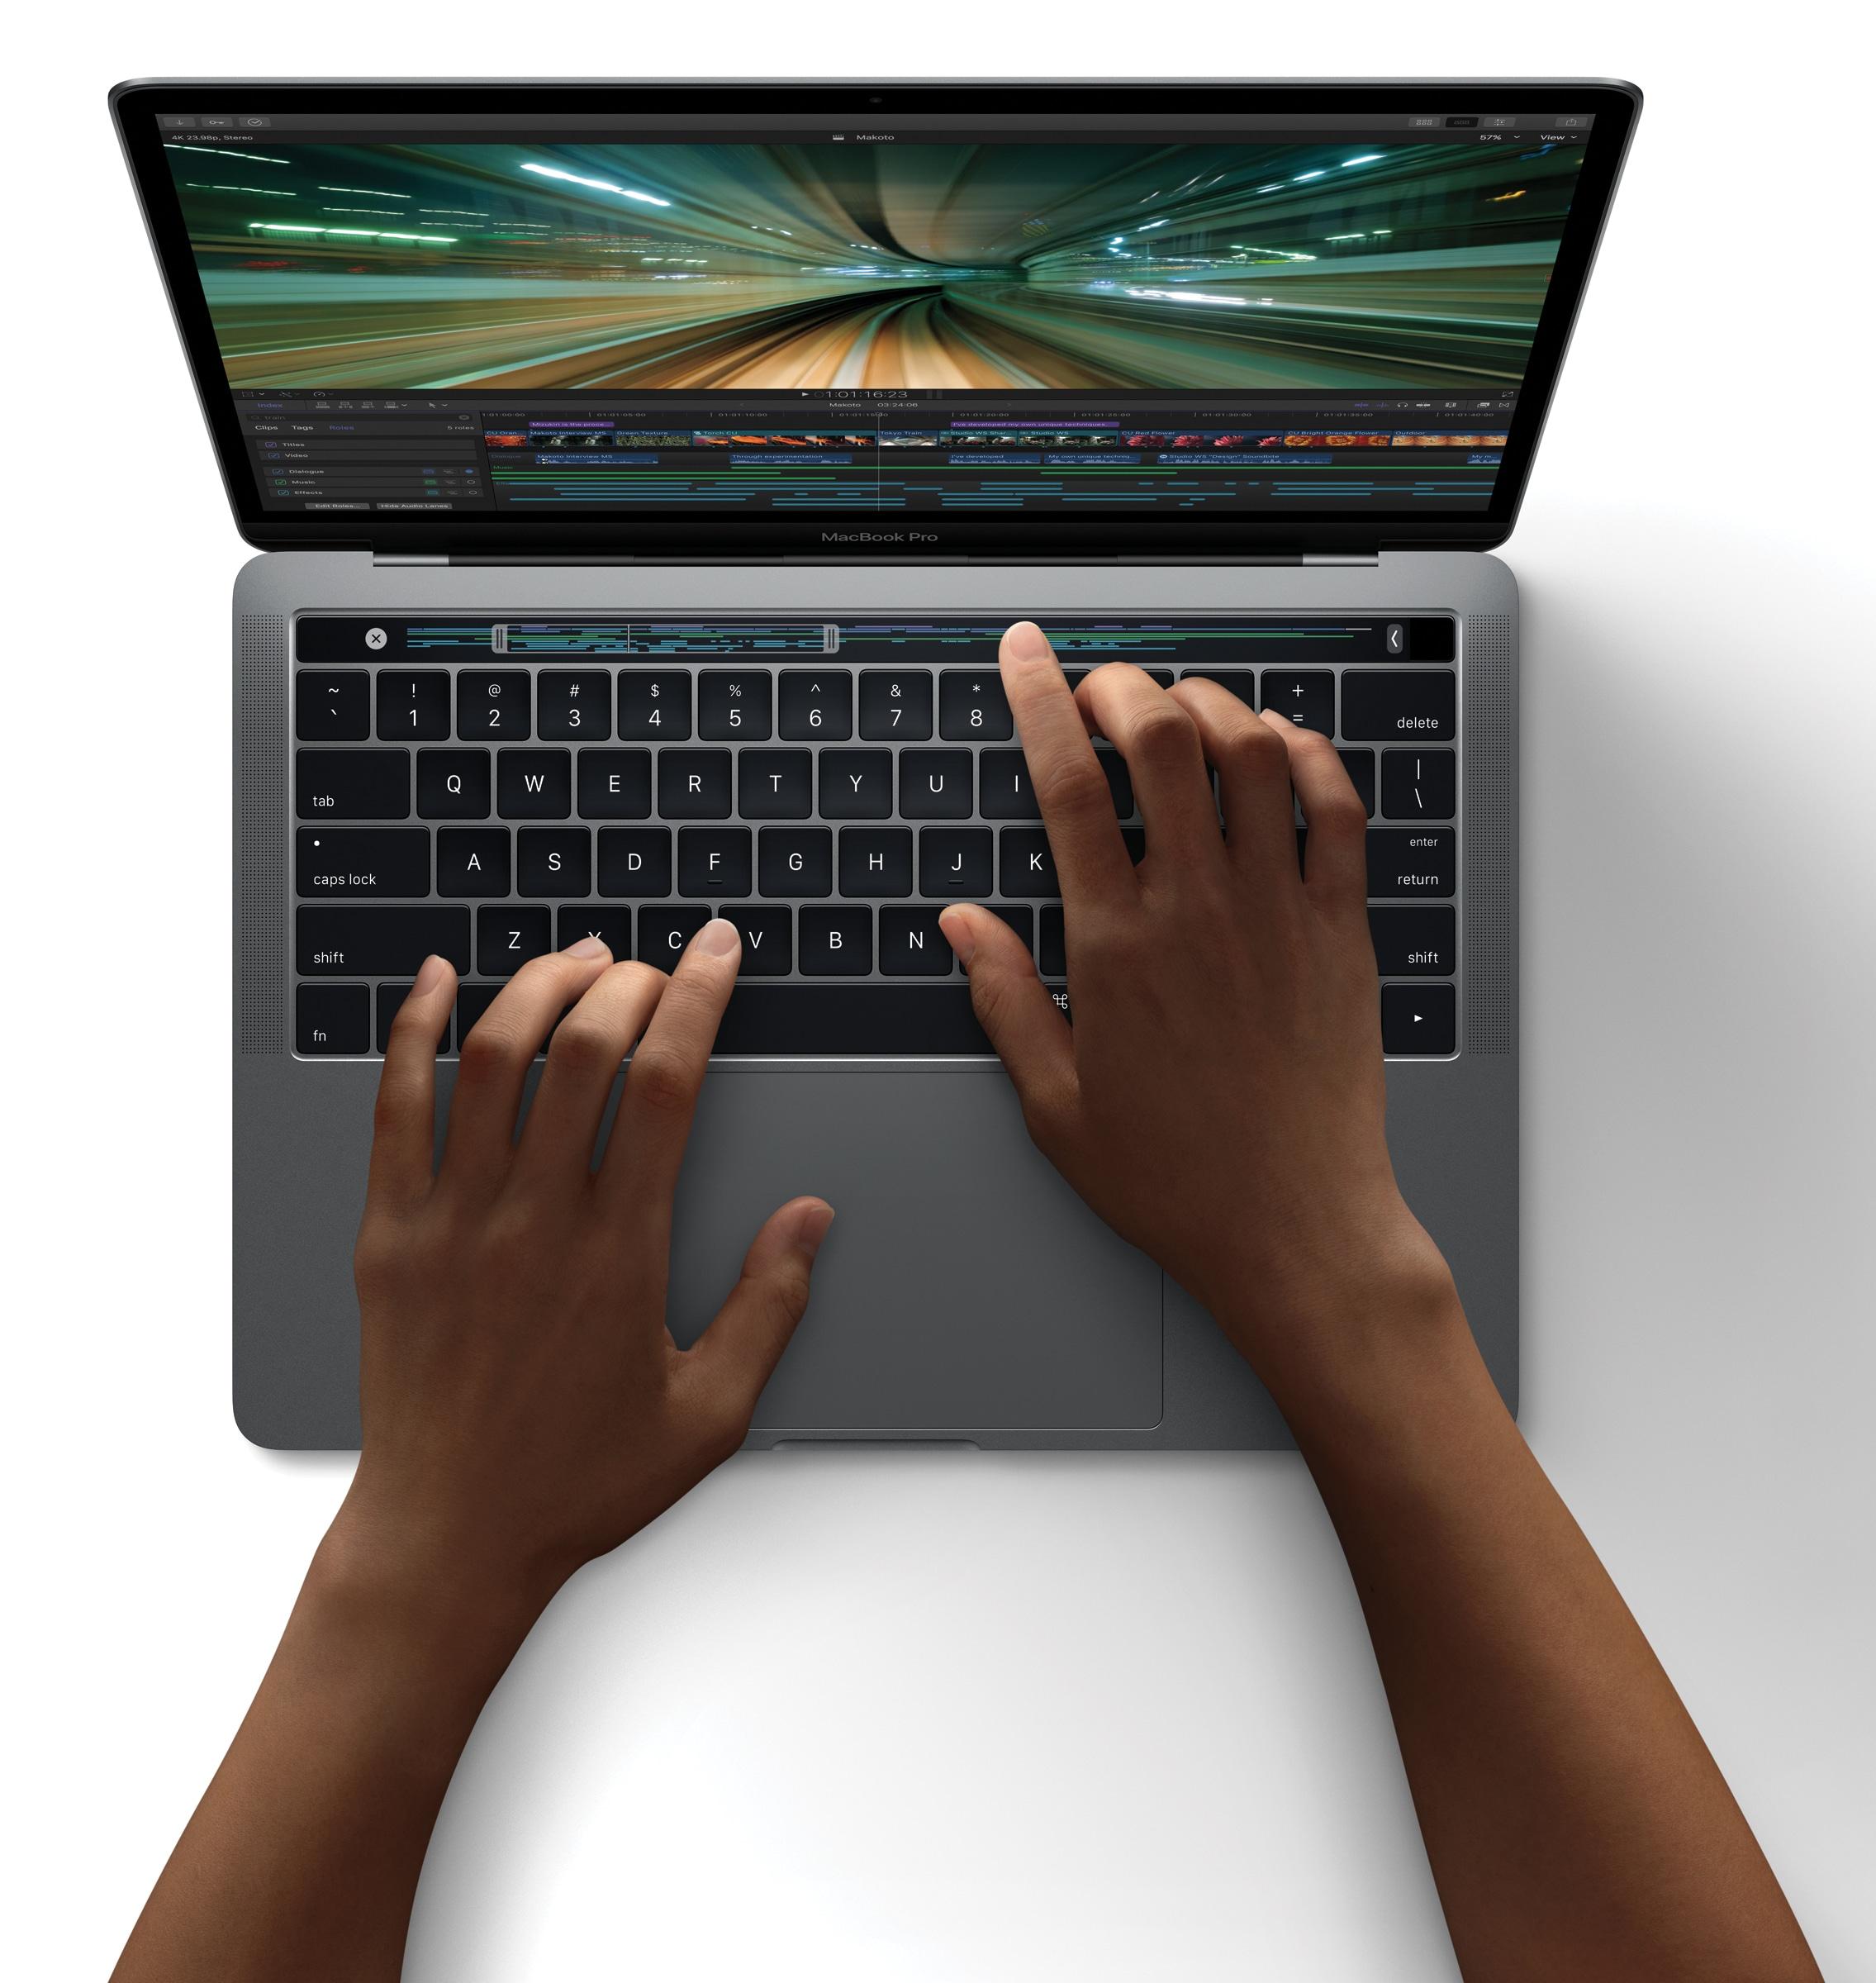 Novo Final Cut Pro X no novo MacBook Pro